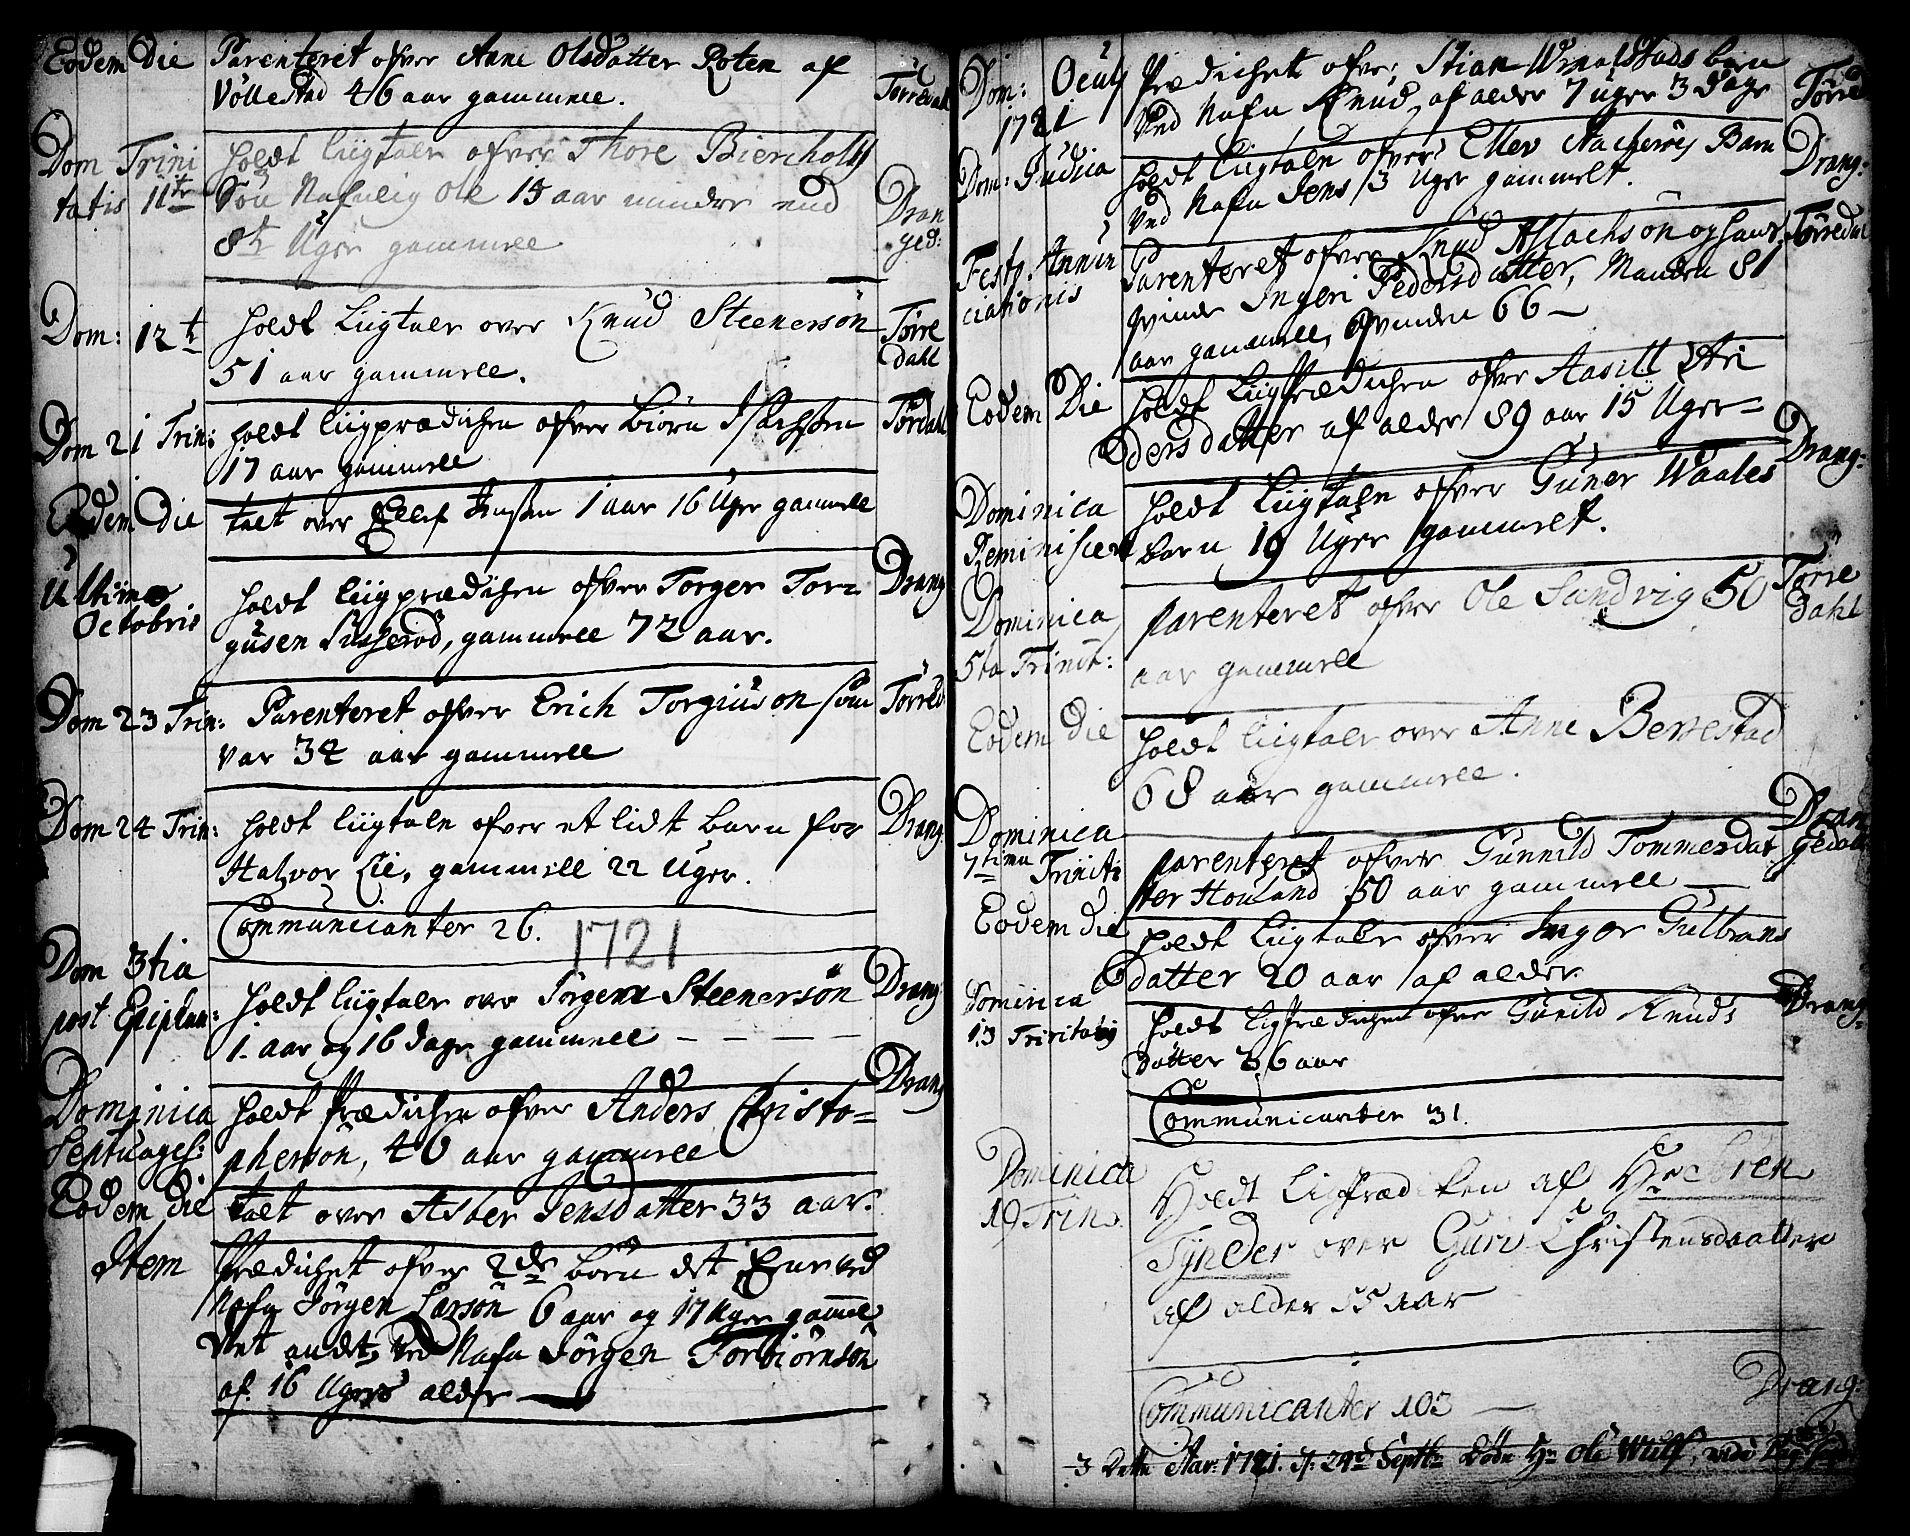 SAKO, Drangedal kirkebøker, F/Fa/L0001: Ministerialbok nr. 1, 1697-1767, s. 76